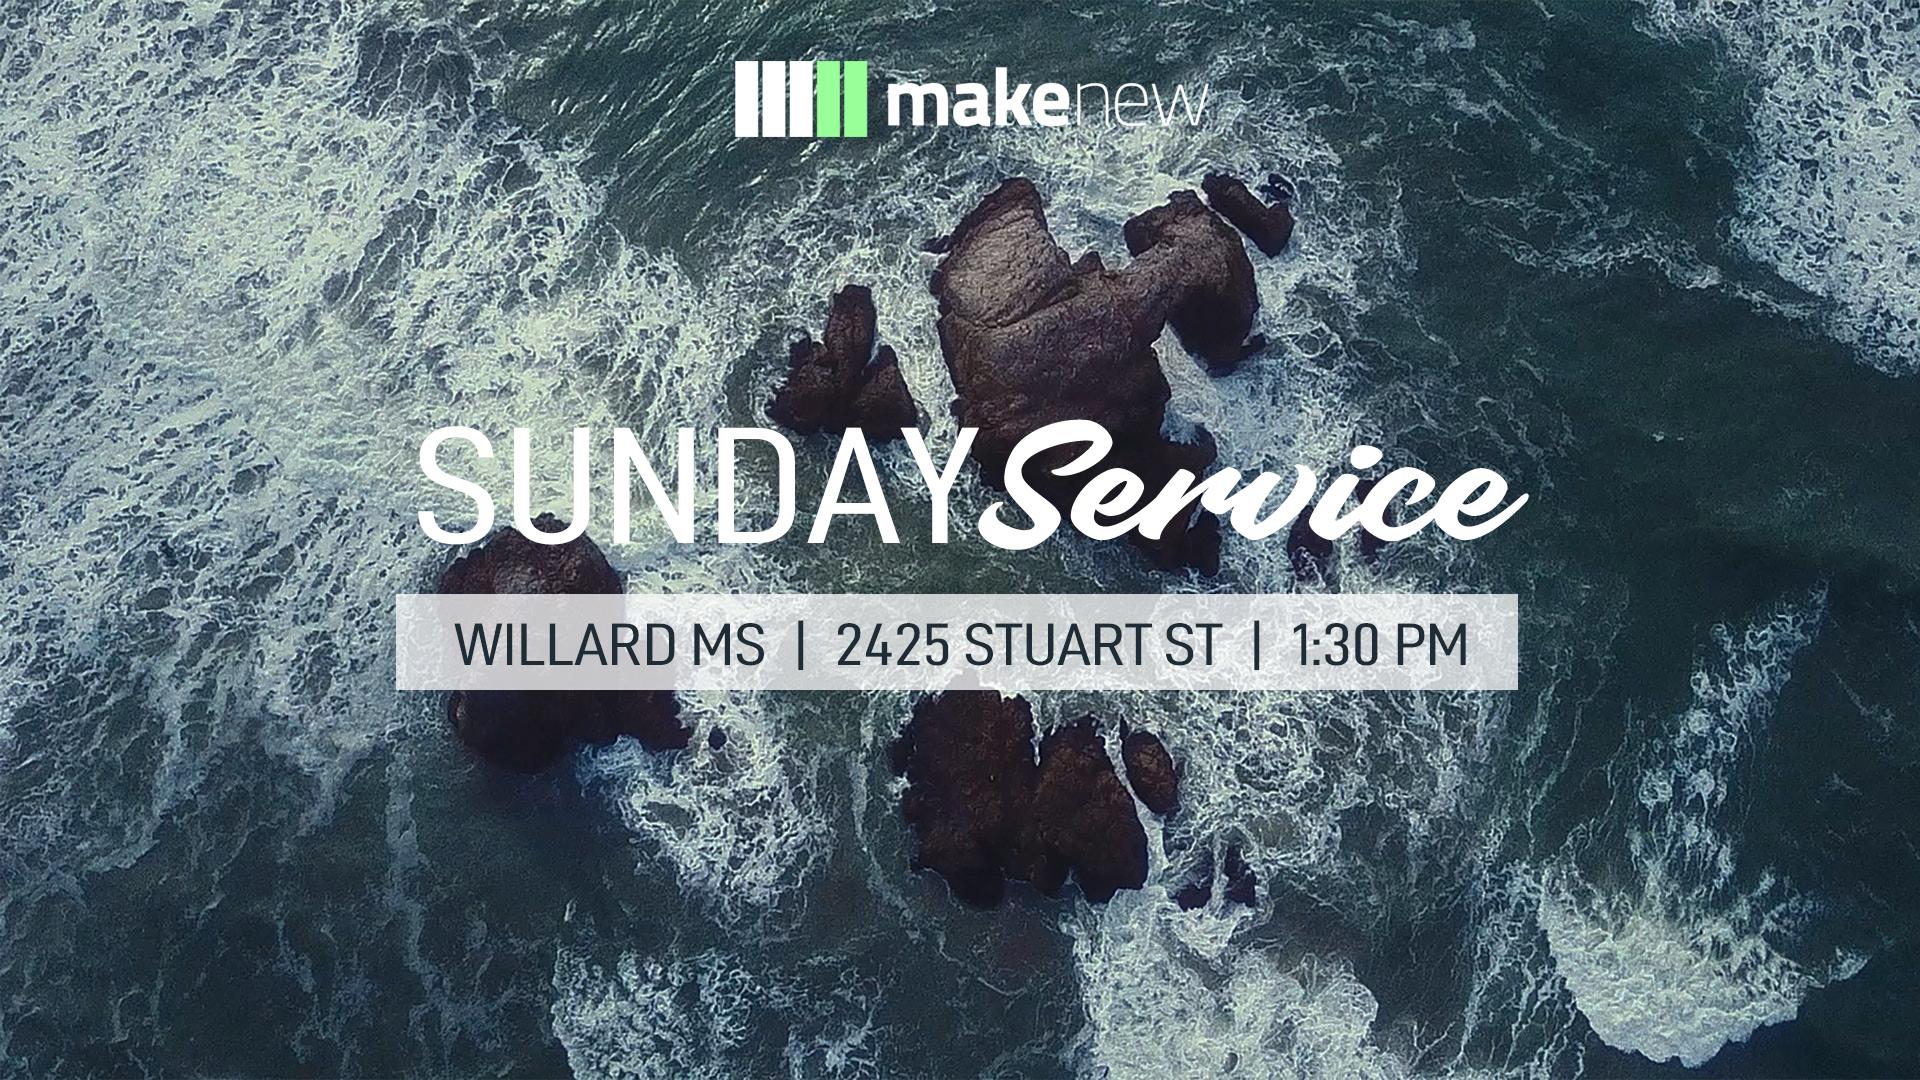 WillardSWS_2019_1920x1080_VD.jpg